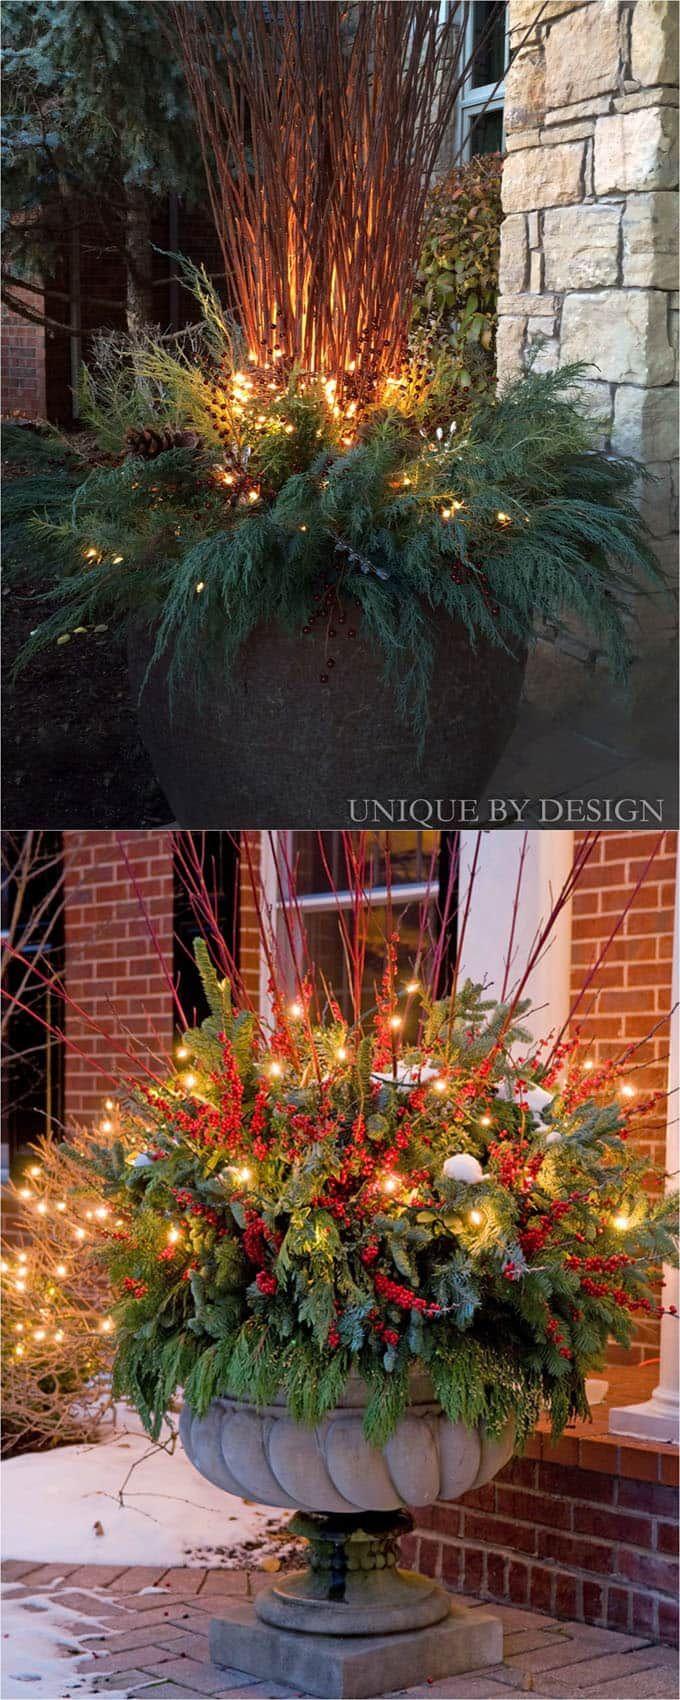 The 25+ best Christmas planters ideas on Pinterest ...